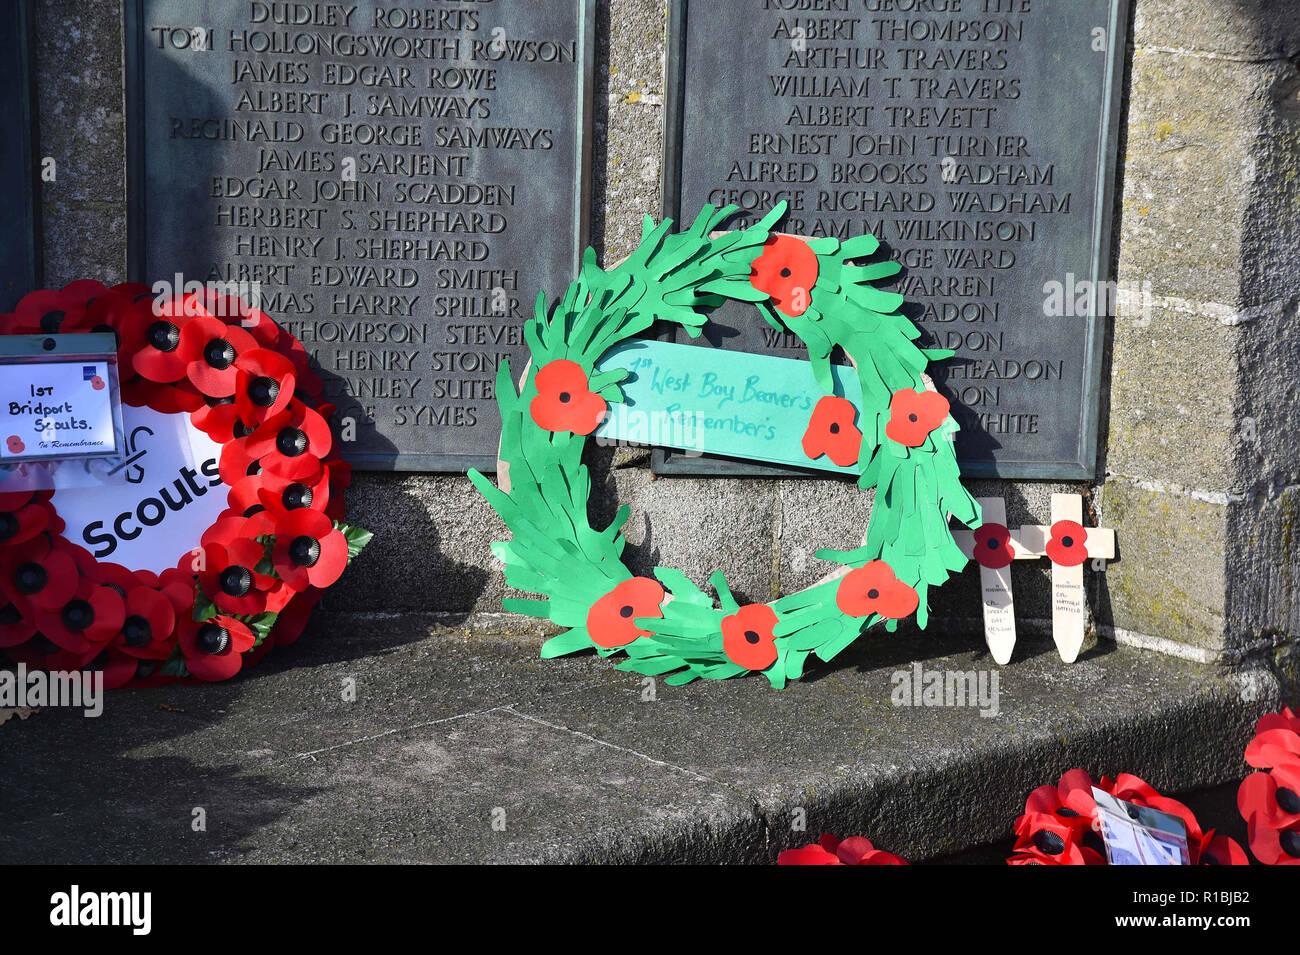 Bridport, Dorset, UK  11th November 2018  Wreaths at the